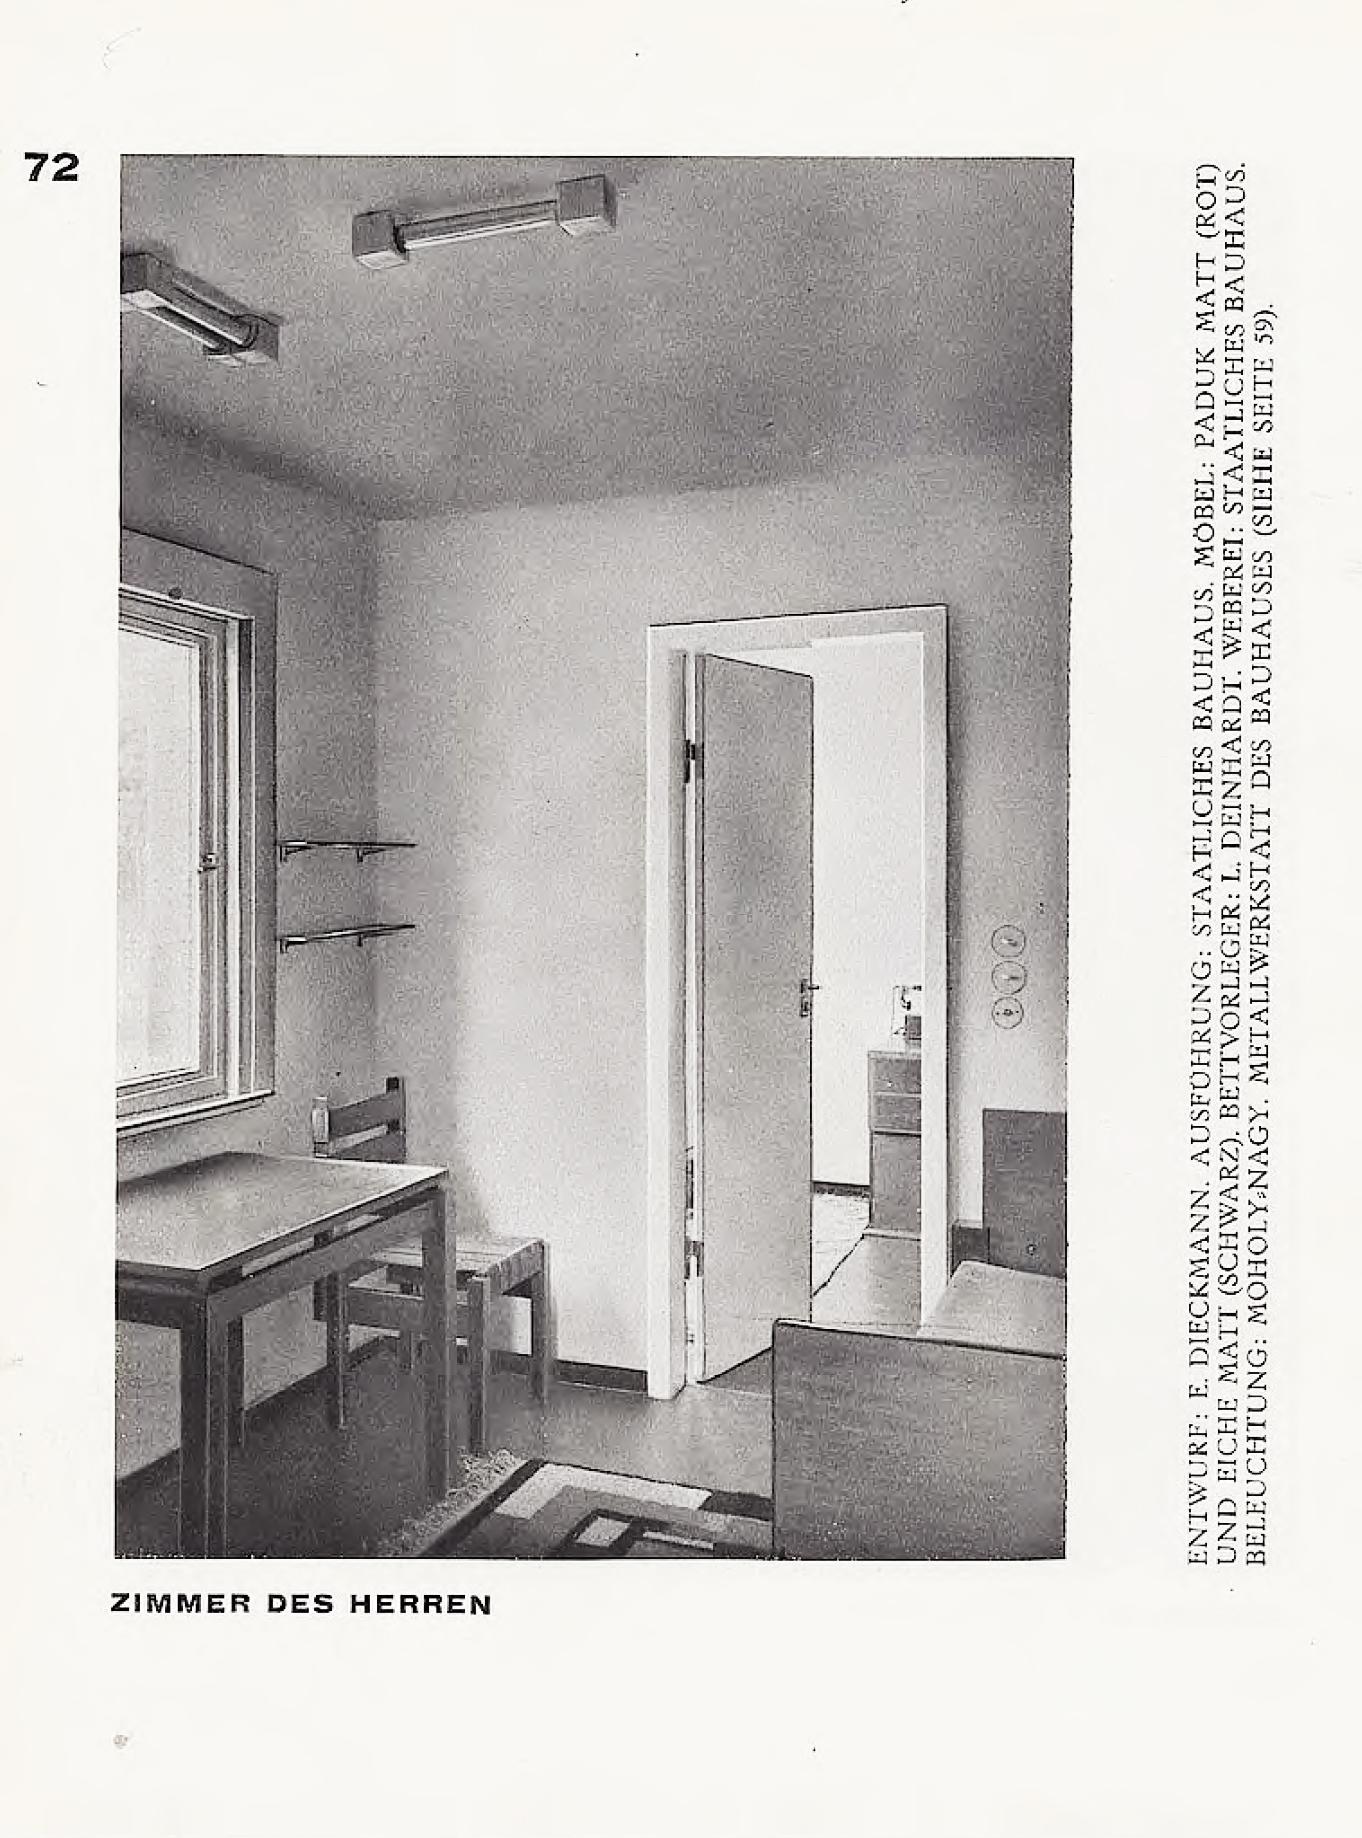 Full Size of Bauhausbuch 03 Meyer Das Versuchshaus Heizkörper Für Bad Elektroheizkörper Bauhaus Fenster Badezimmer Wohnzimmer Wohnzimmer Heizkörper Bauhaus